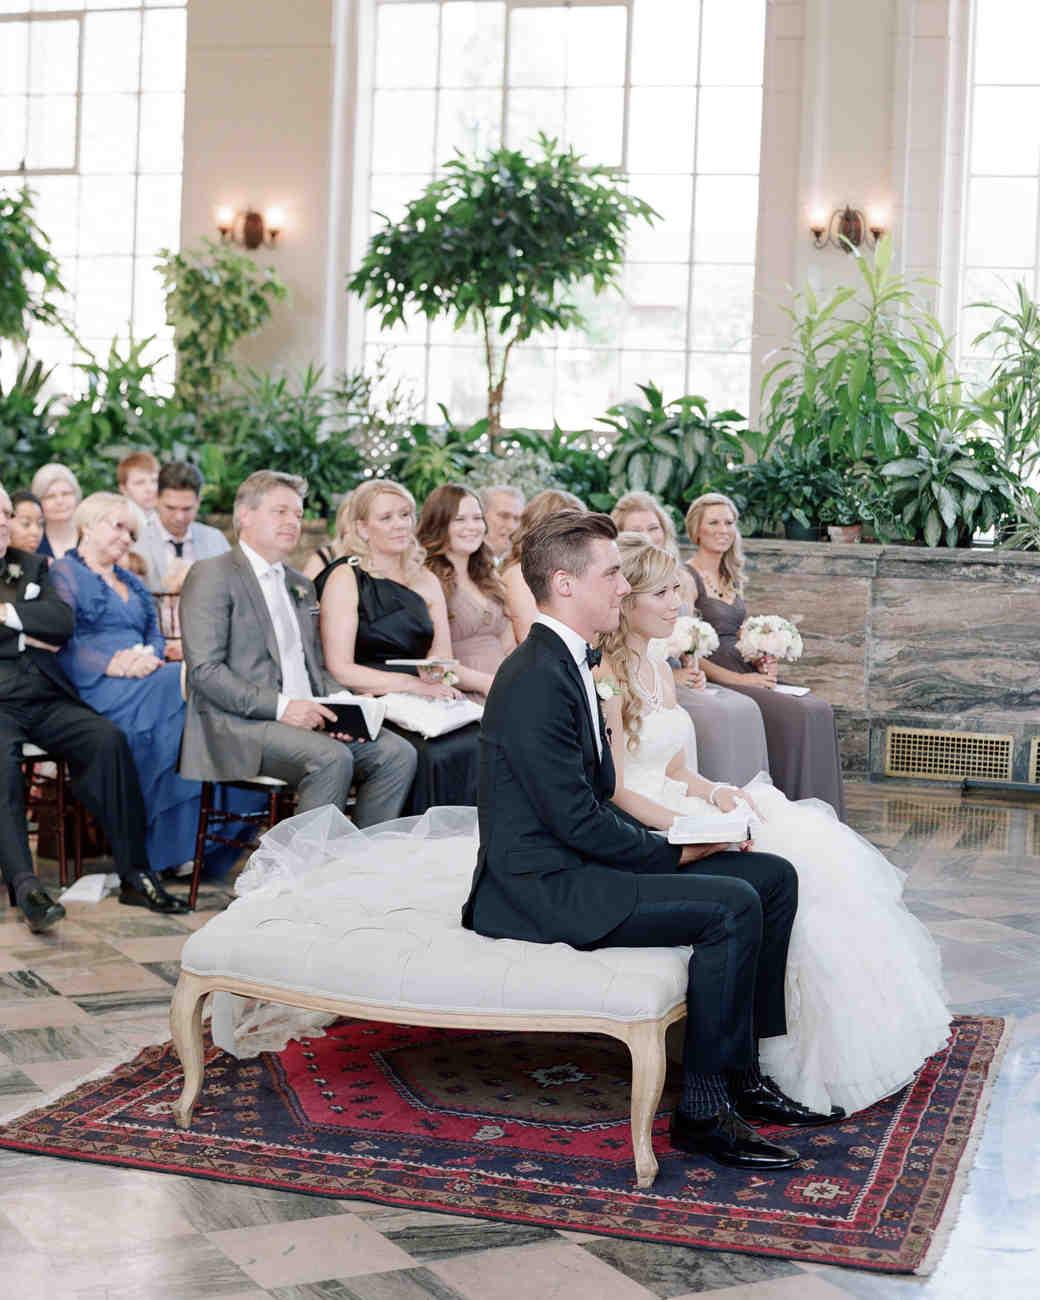 brittany-jeff-wedding-ceremony-113-s111415-0714.jpg